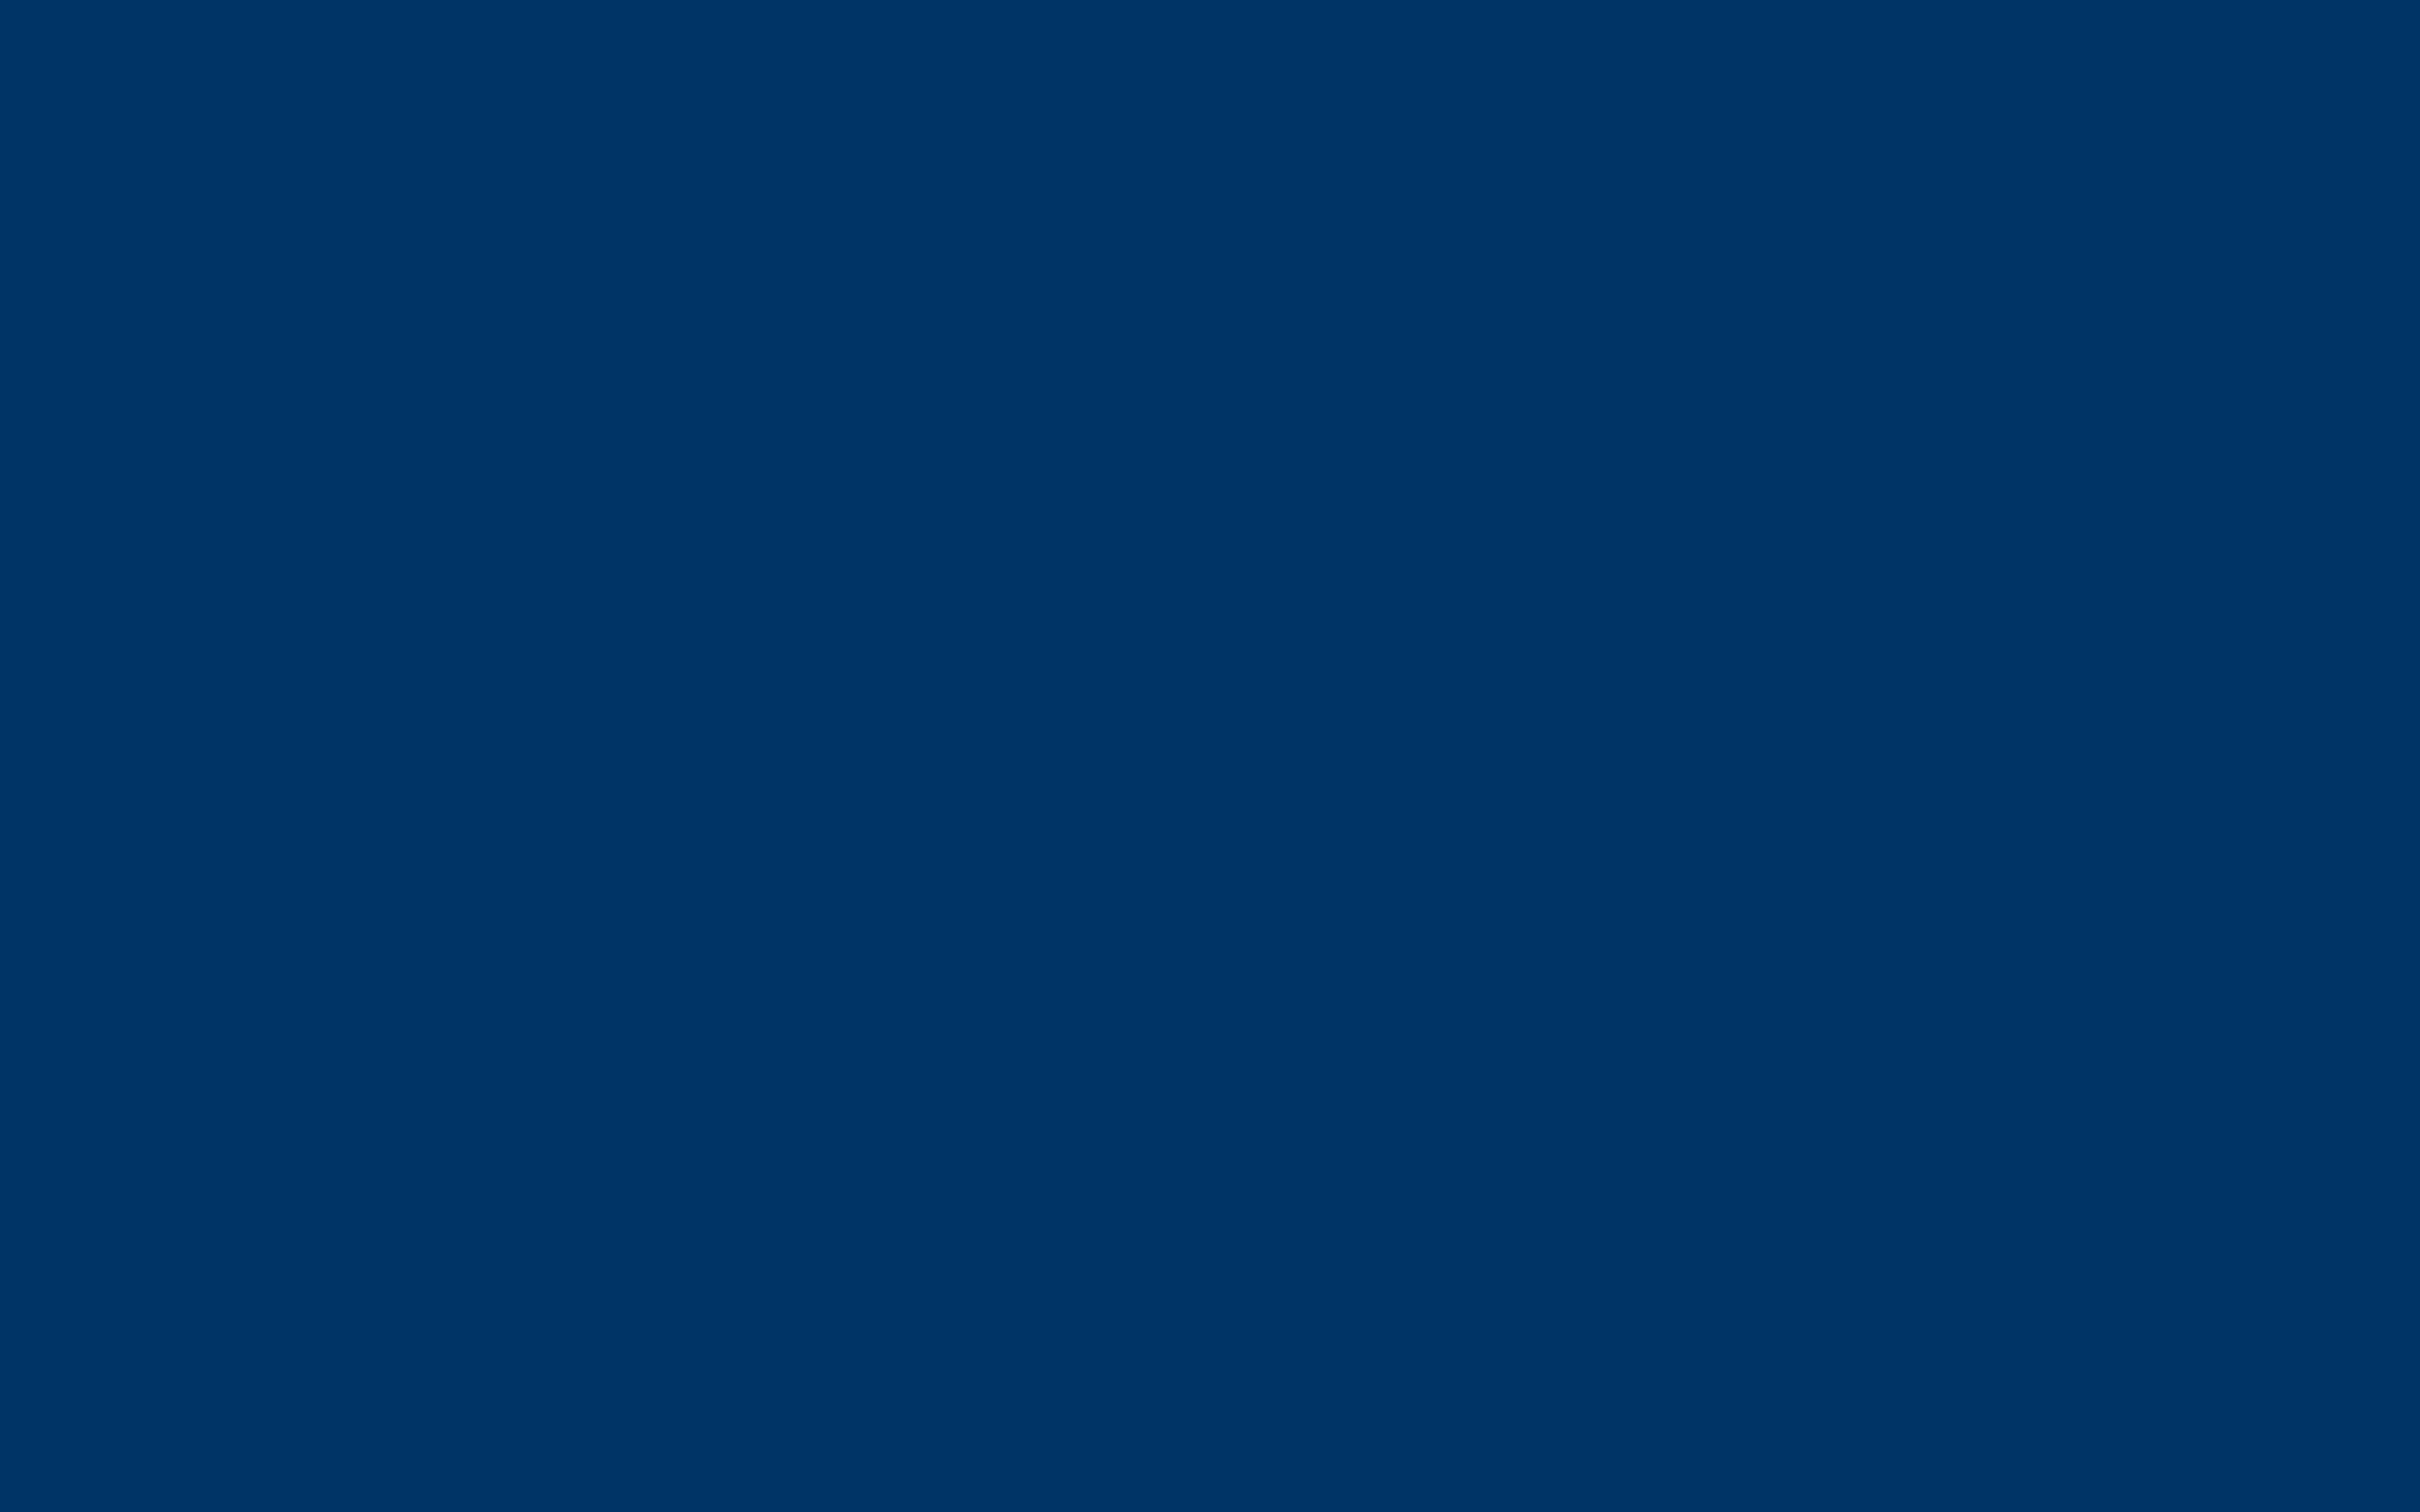 2560x1600 Dark Midnight Blue Solid Color Background